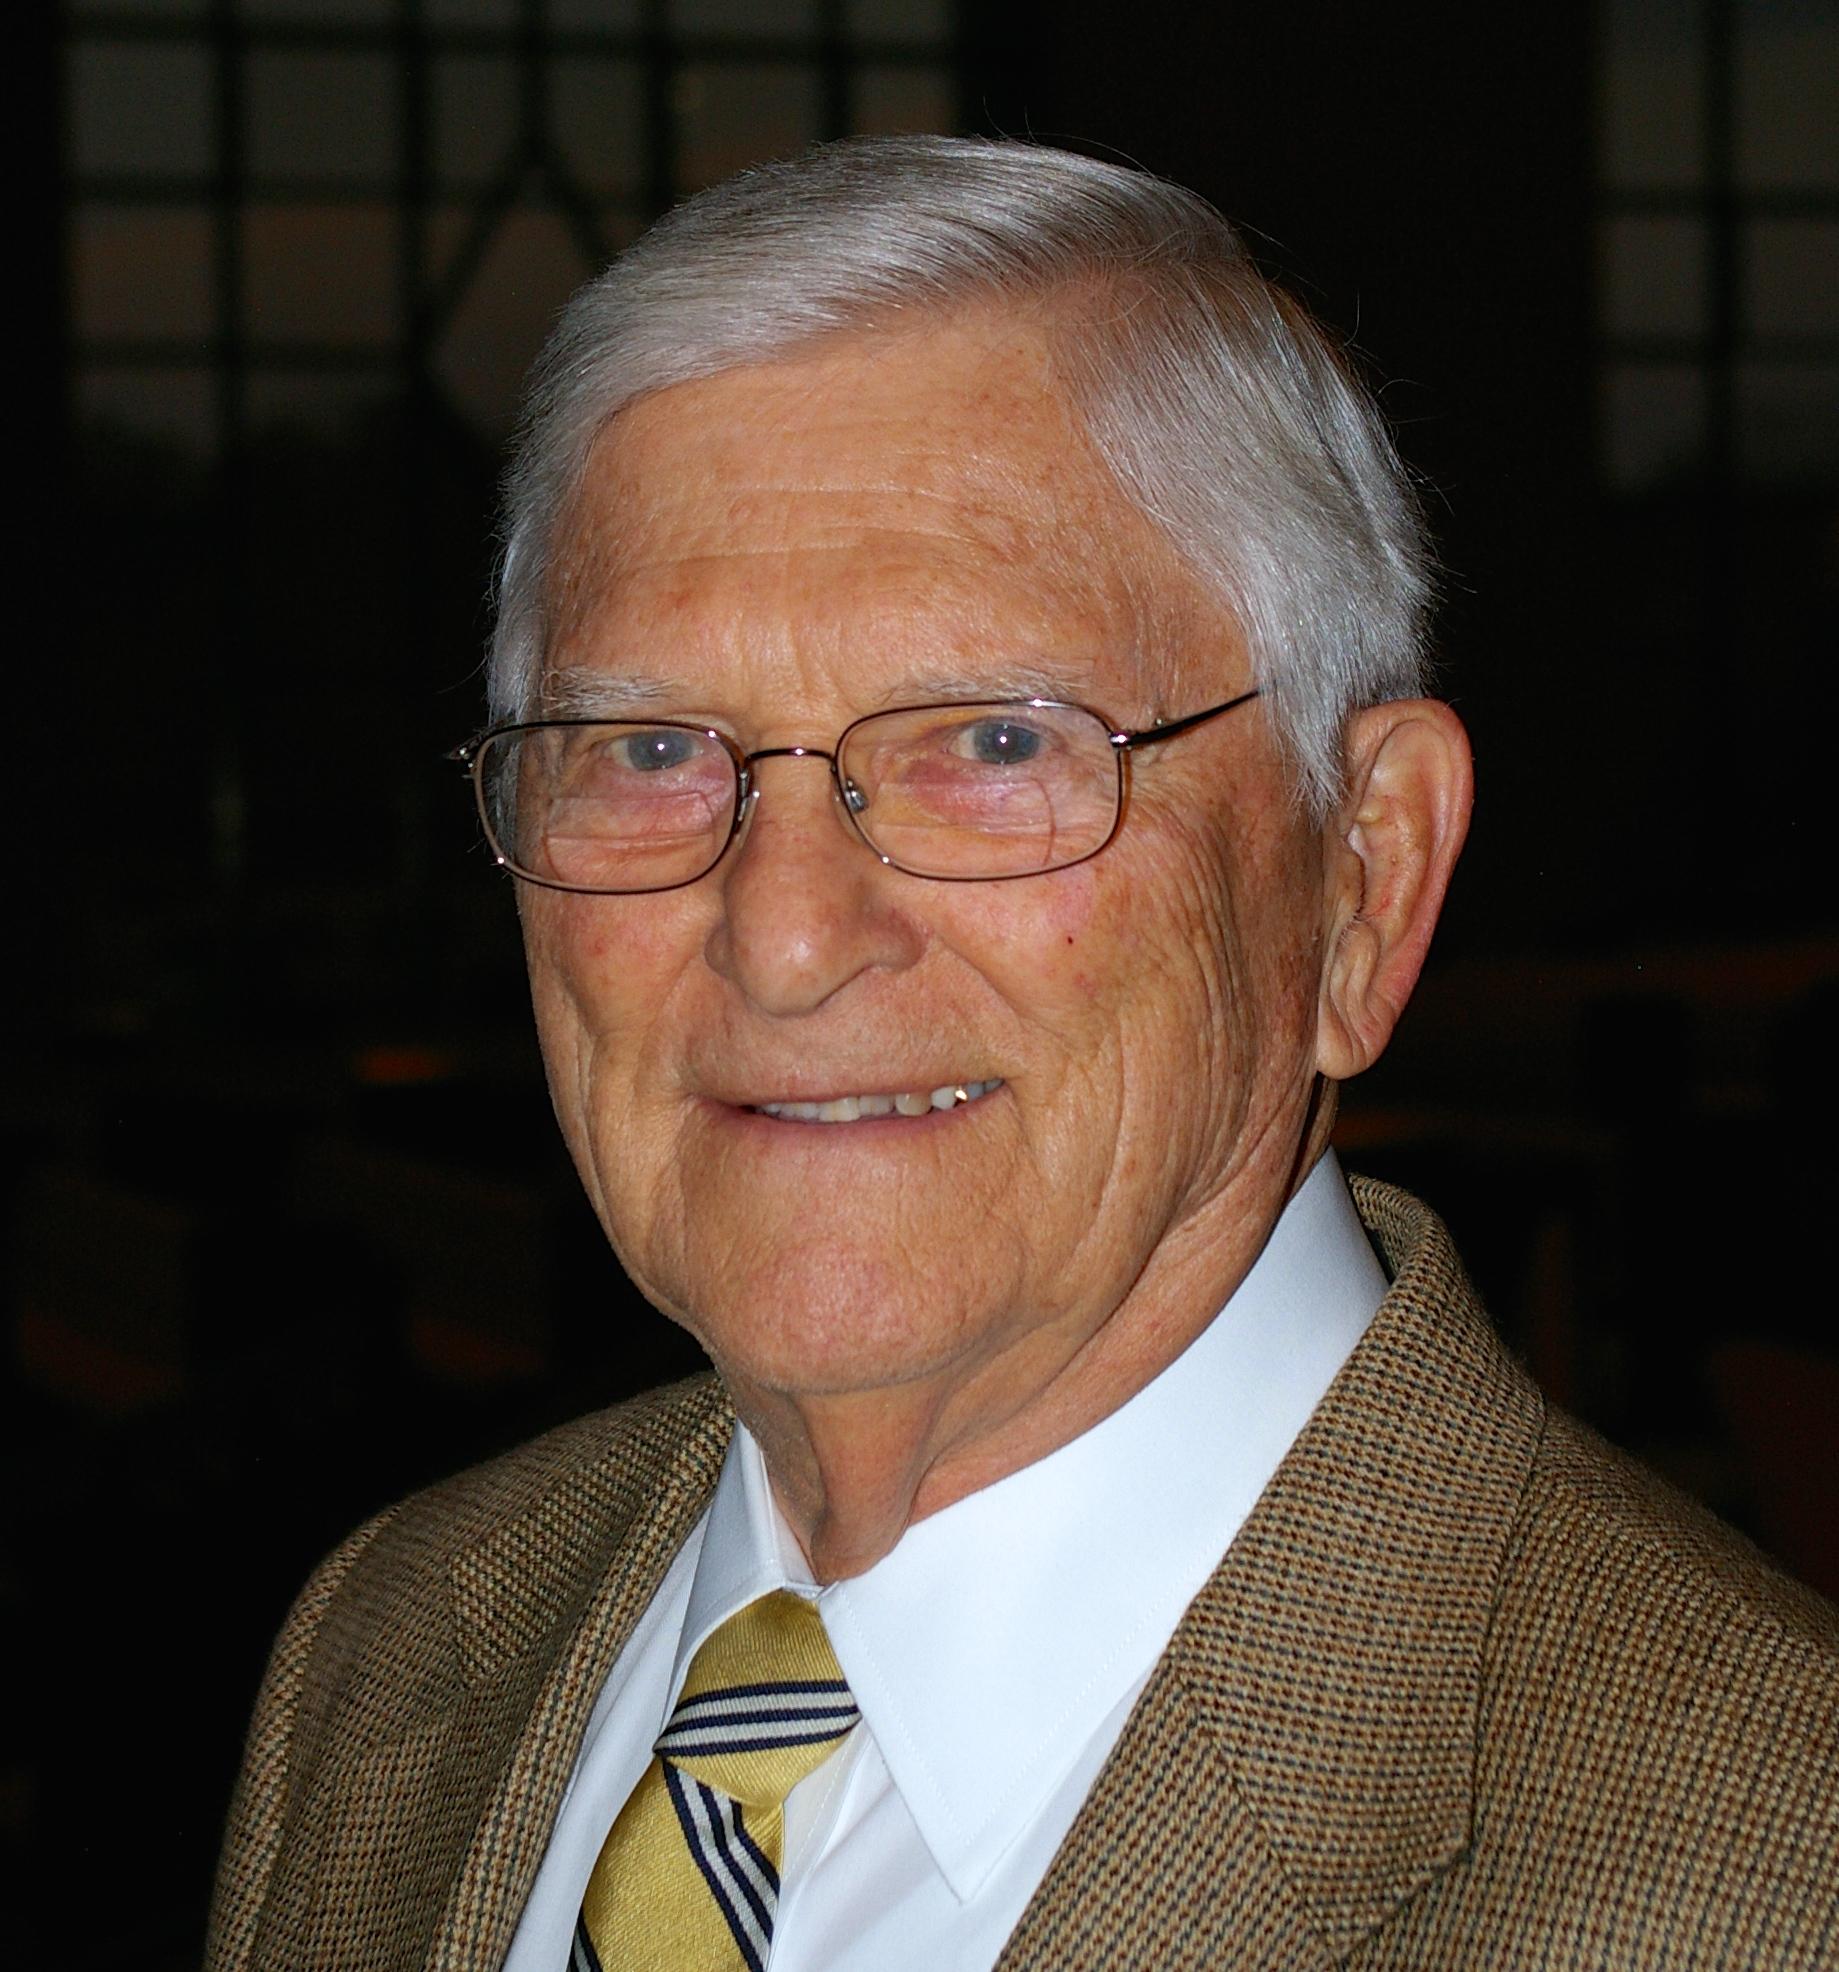 Bill Harding III honored as  2014 CIU Alumnus of the Year